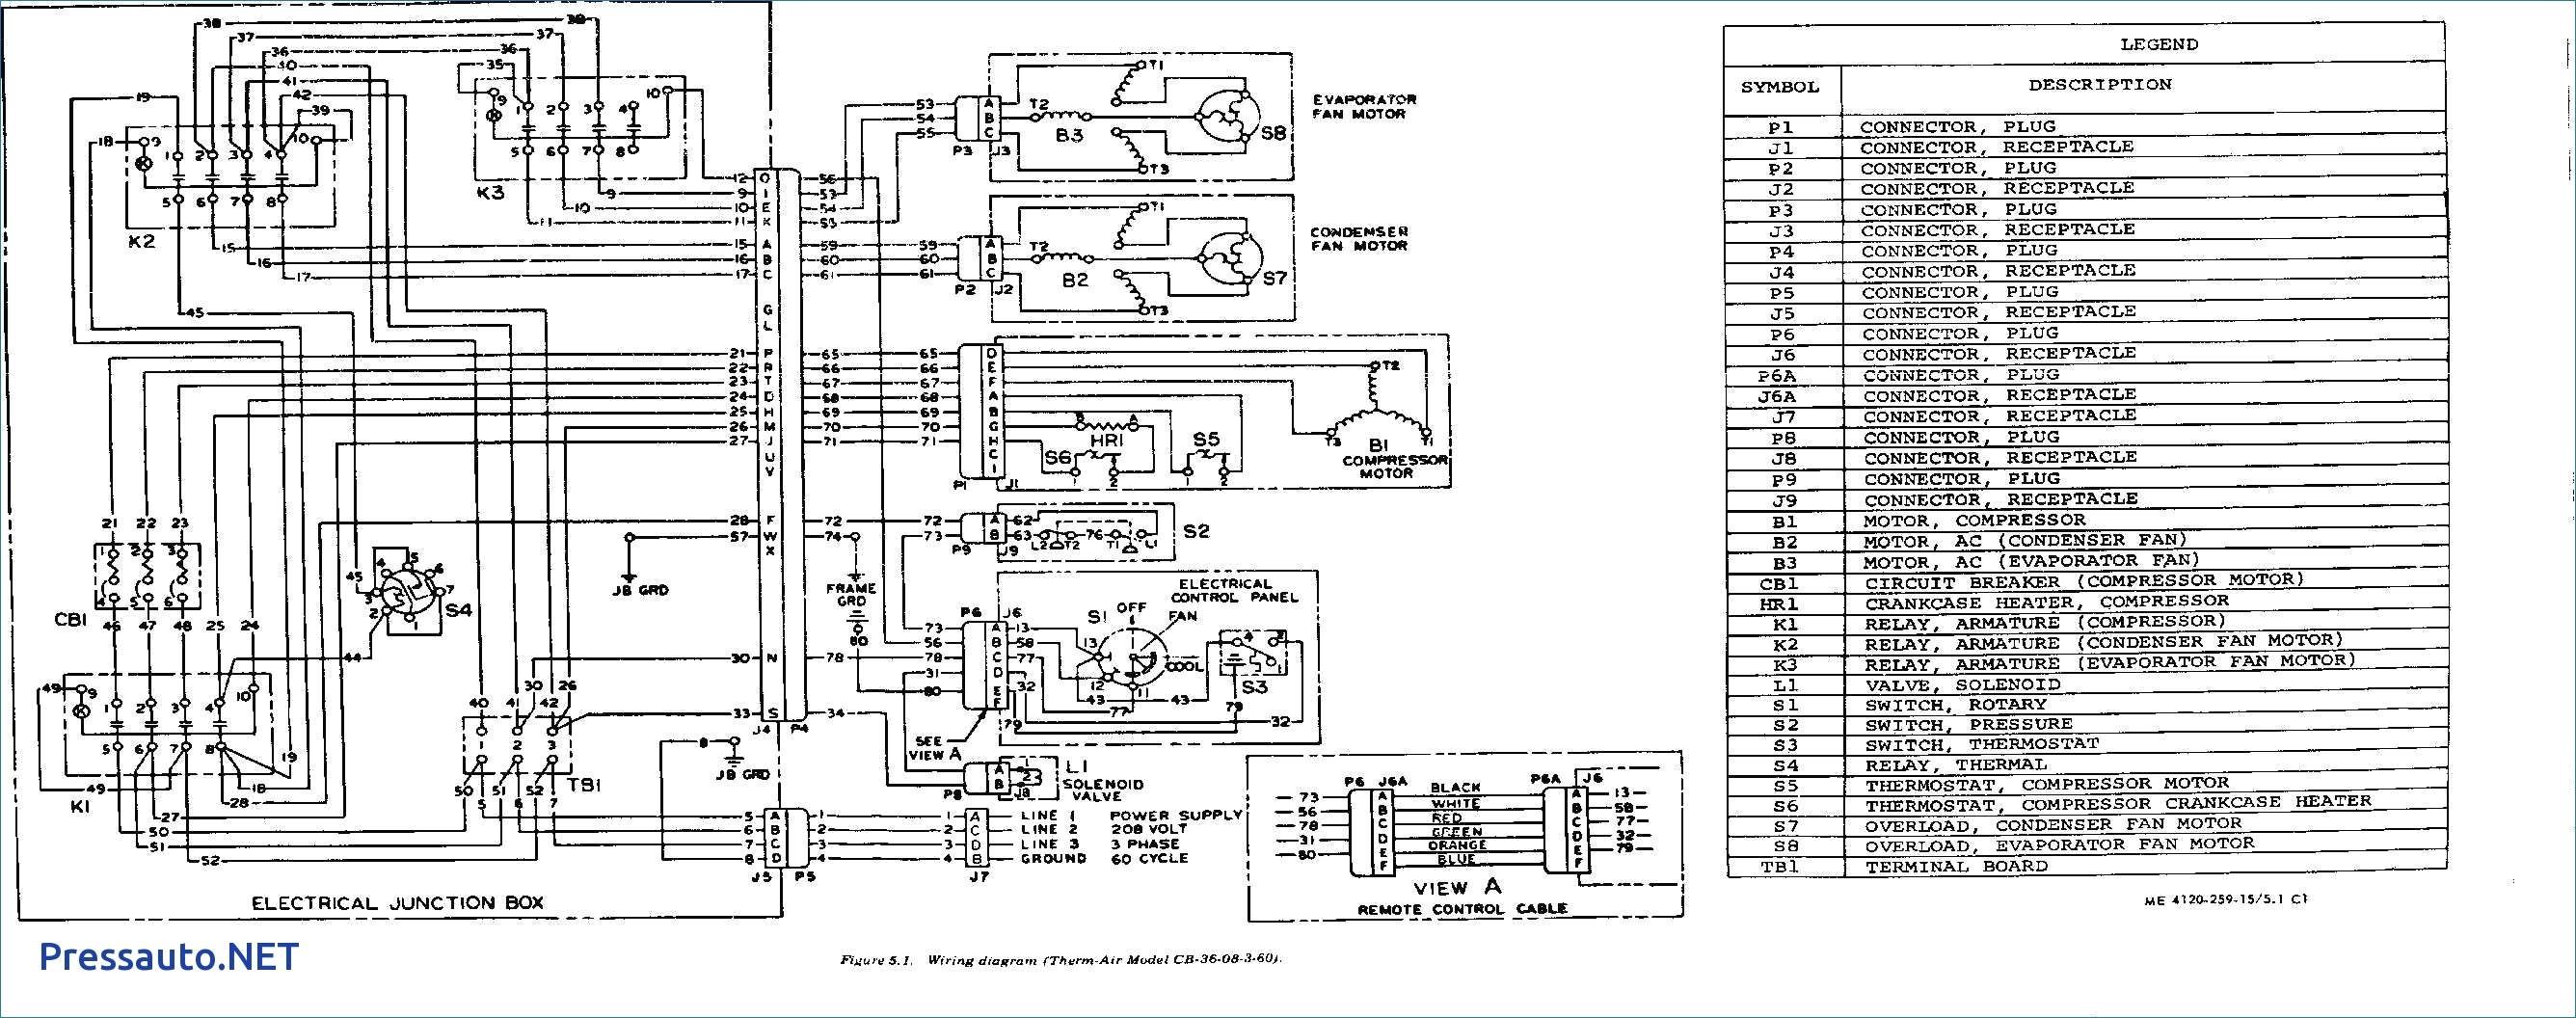 trane wiring diagram ycd150 wire center u2022 rh sischool co